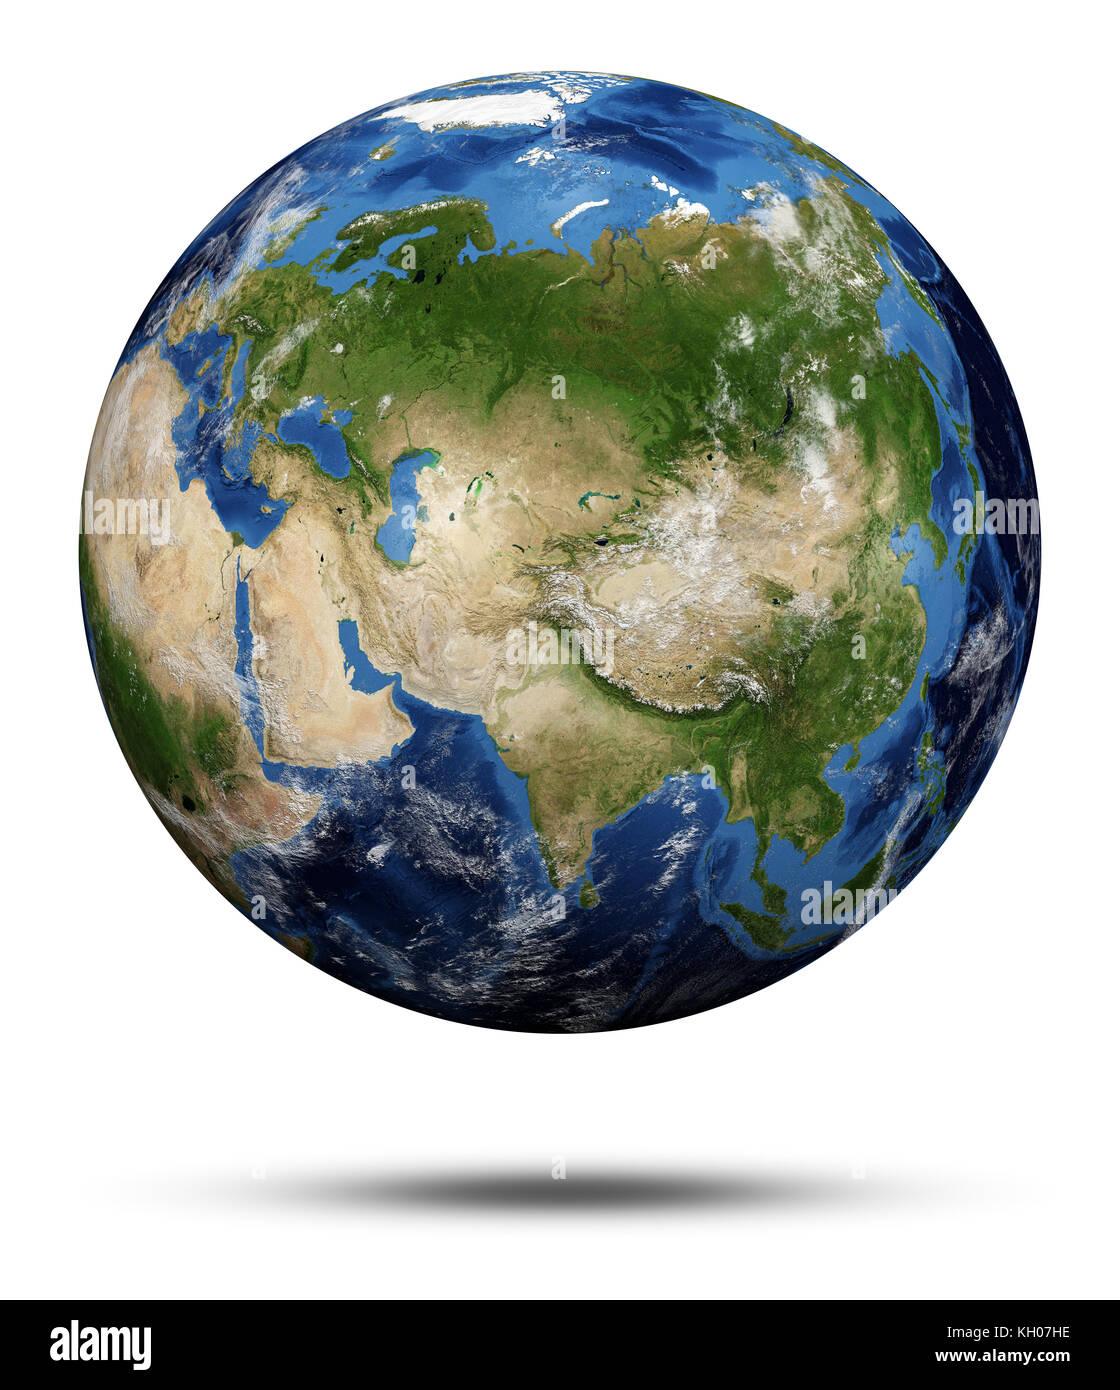 Globe Map 3d : globe, Planet, Earth., Earth, Globe, Rendering,, Courtesy, Stock, Photo, Alamy